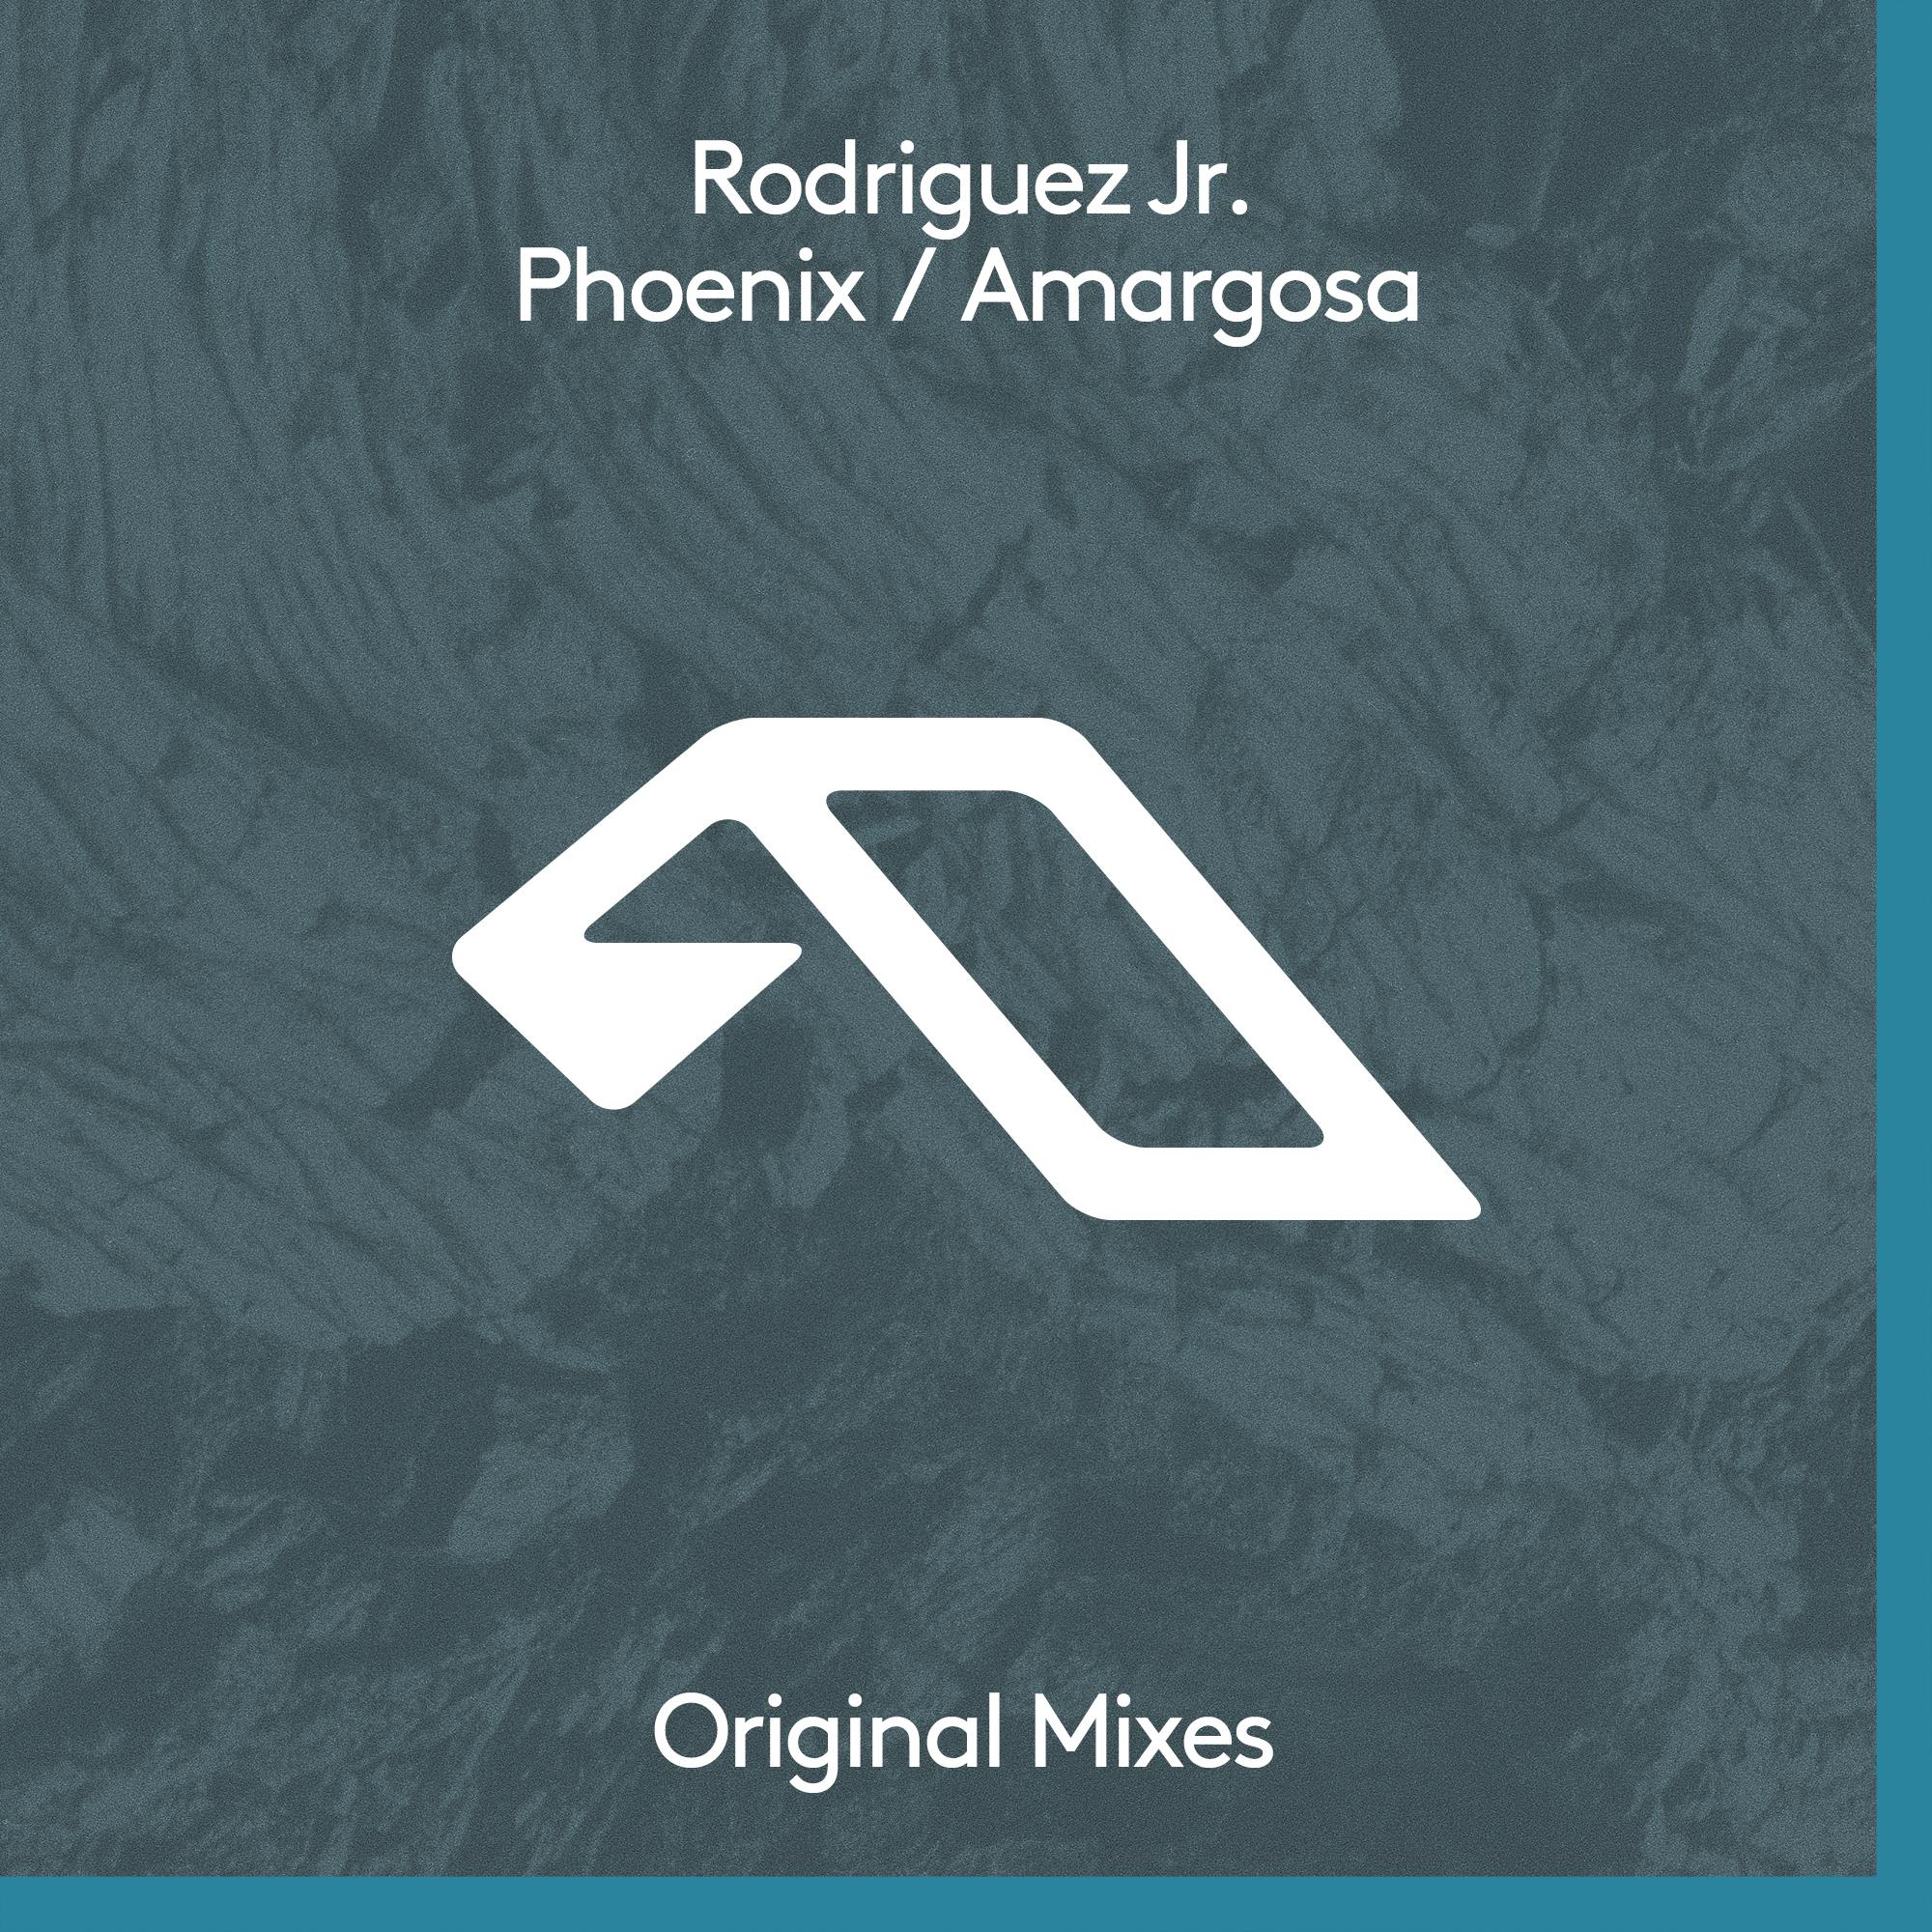 01 - ANJDEEXXXD Rodriguez Jr - Phoenix  Amargosa.jpg